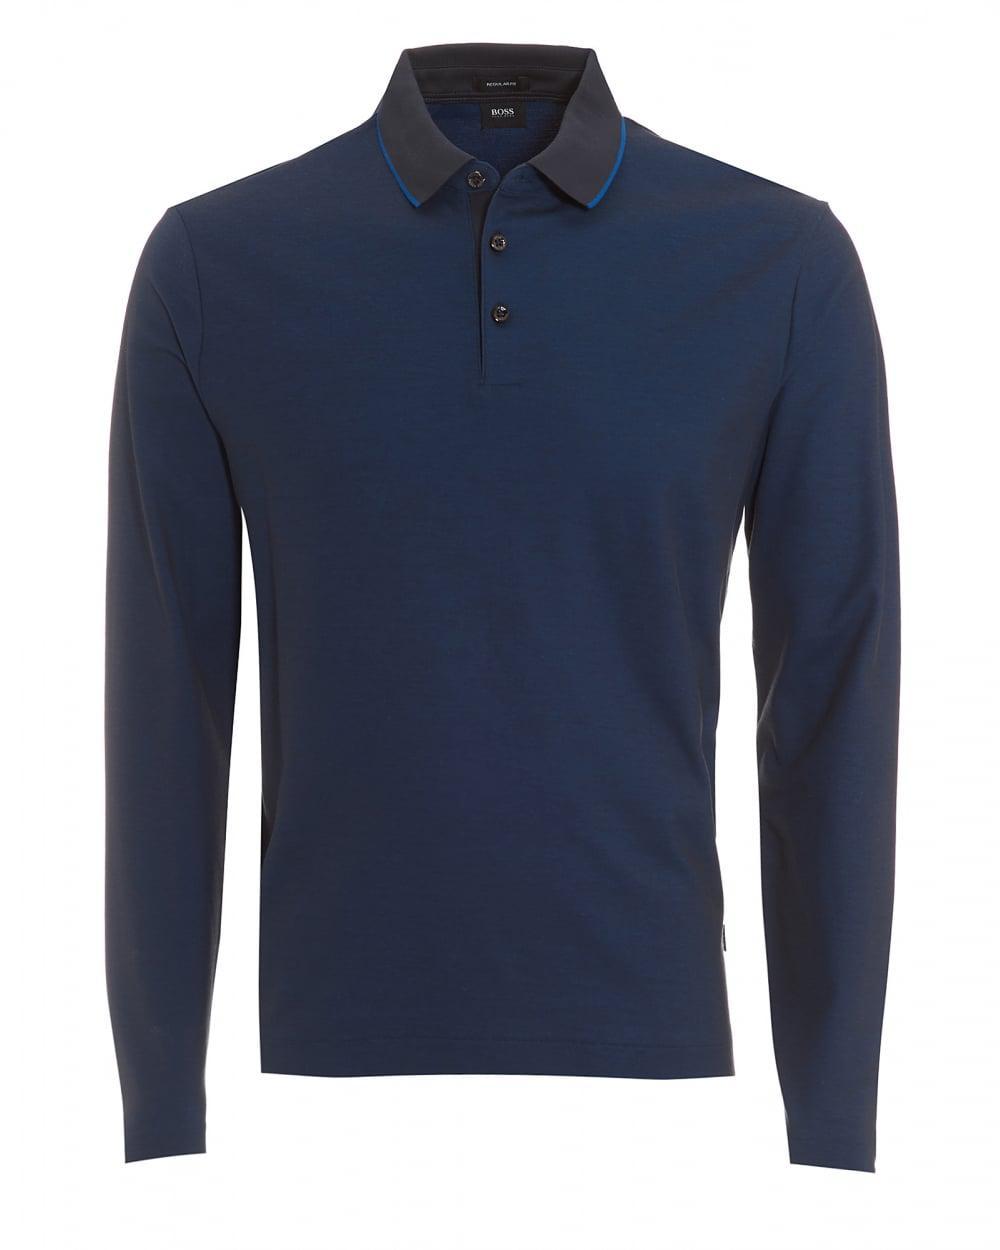 Lyst boss black pado 05 polo long sleeved tipped navy for Mens navy polo shirt